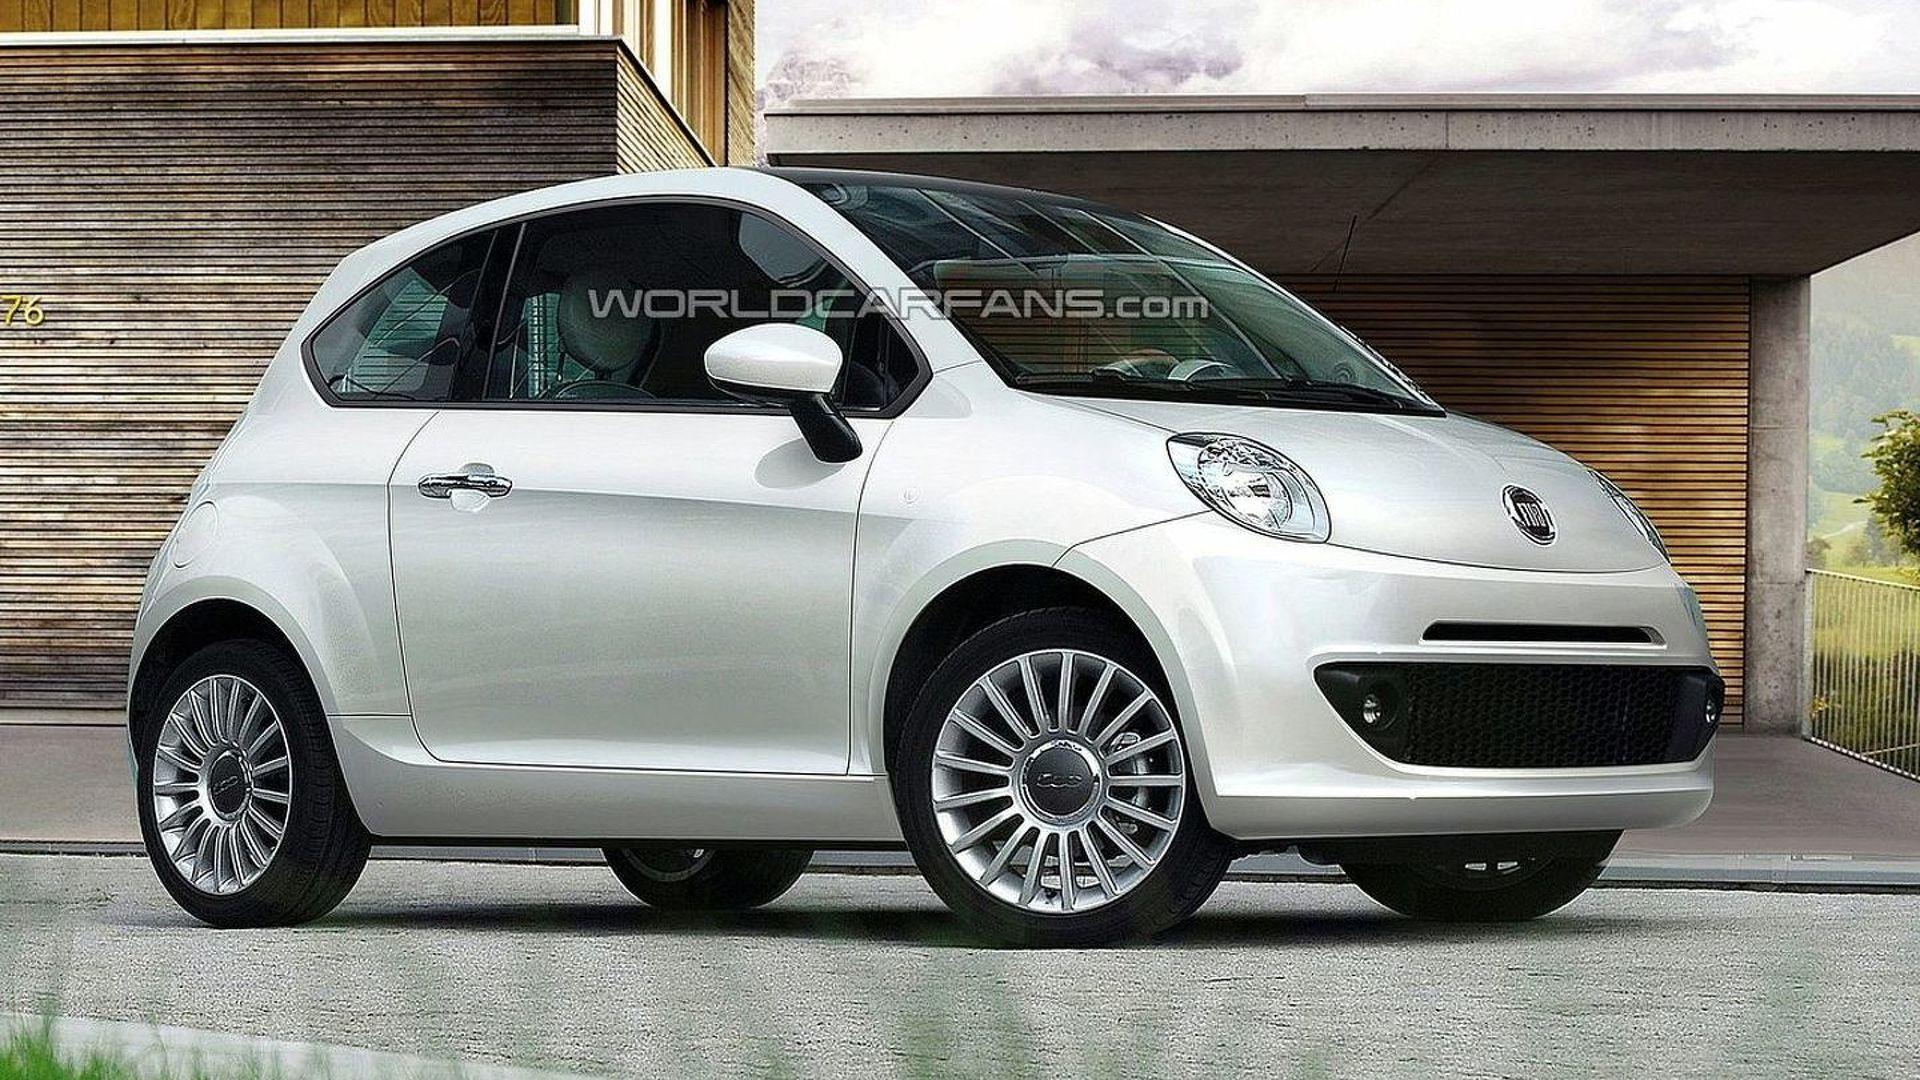 Fiat working on 80g/km hybrid city car